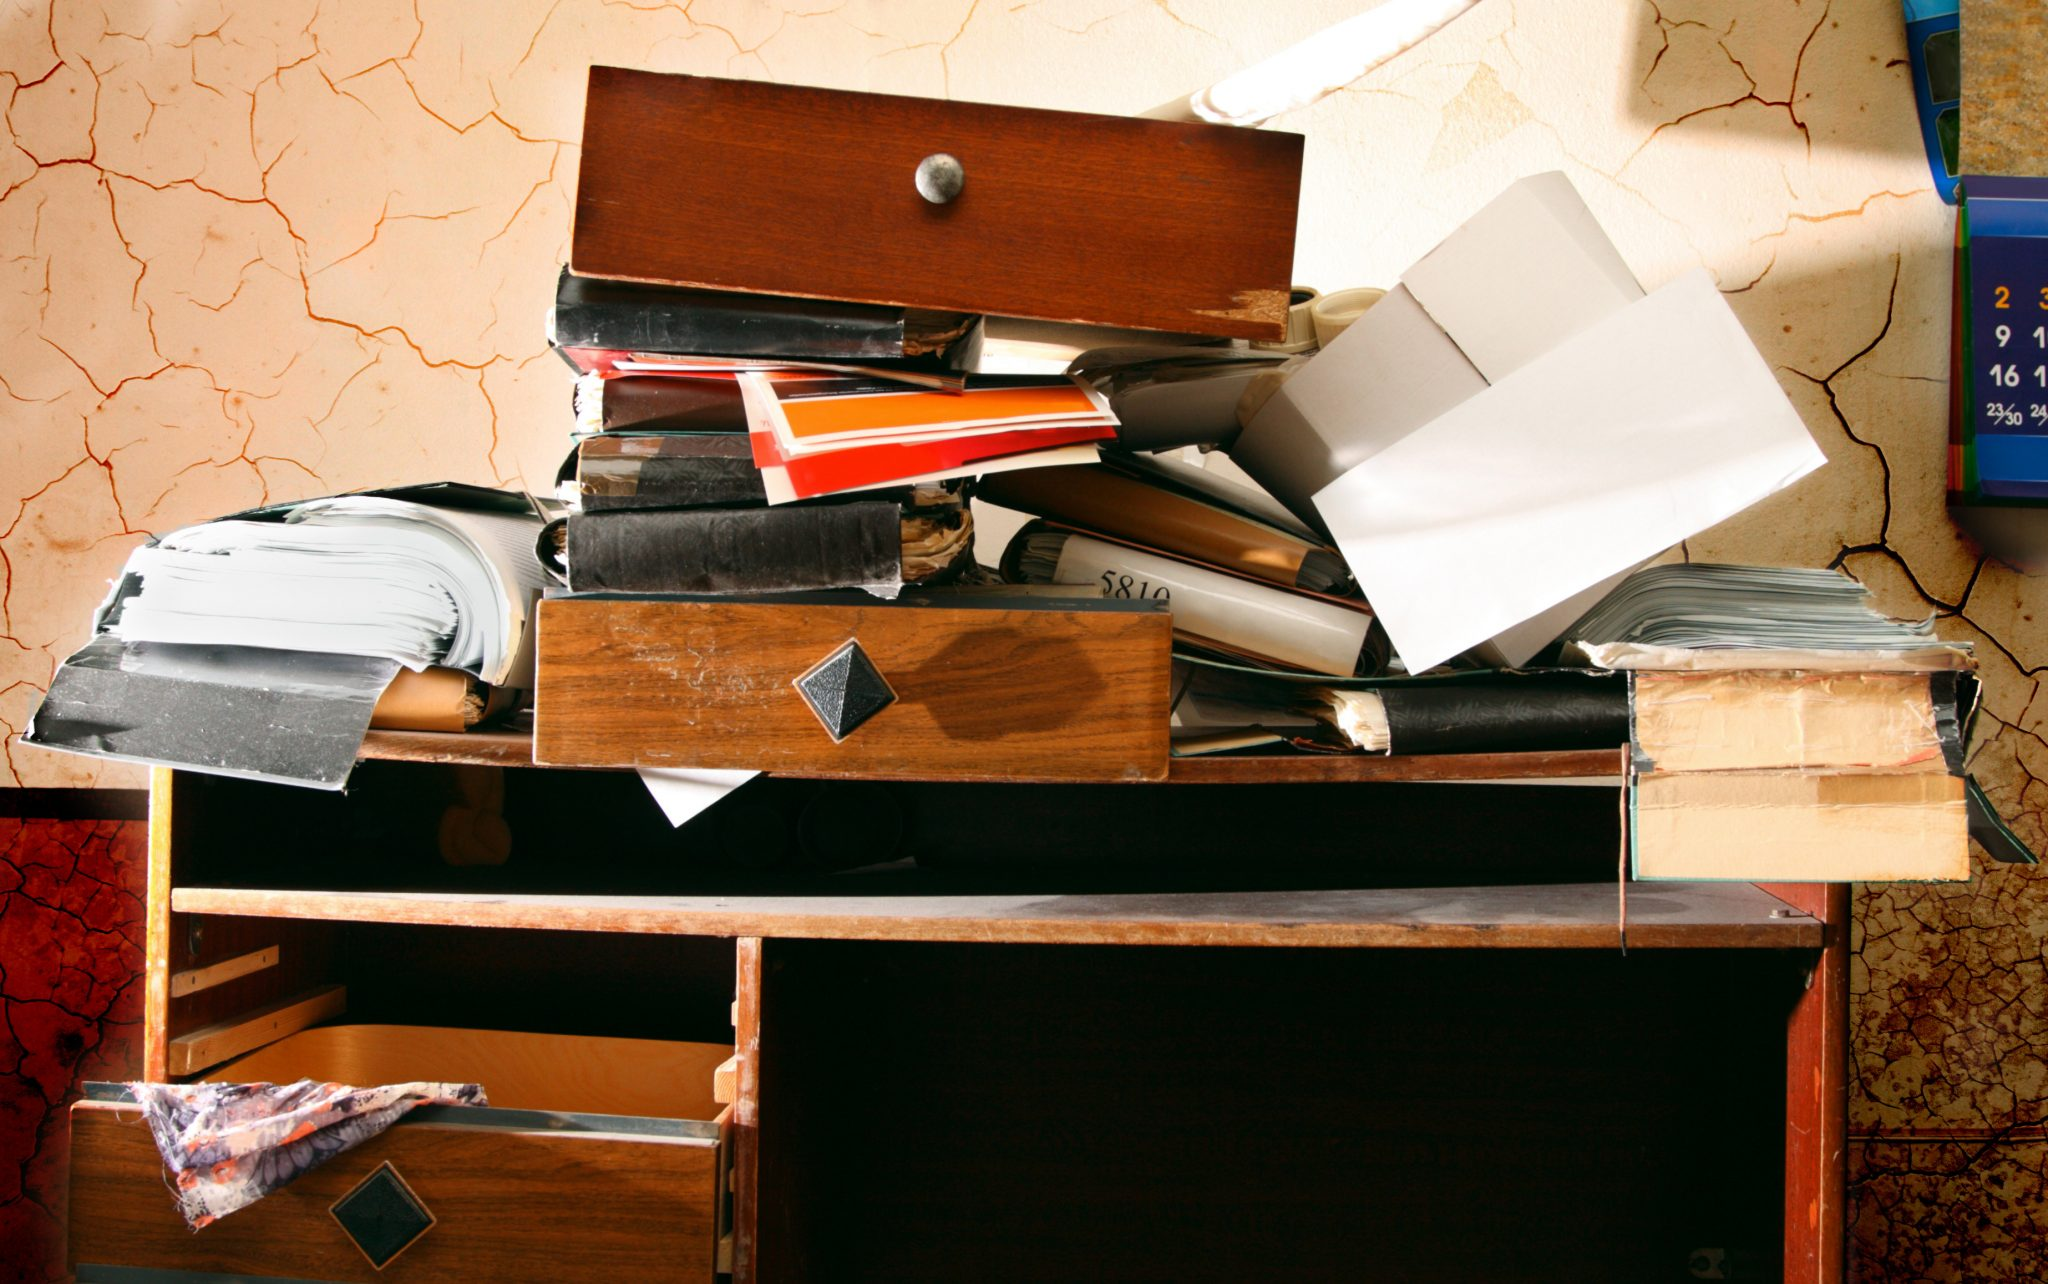 Mesa de Estudos Desorganizada